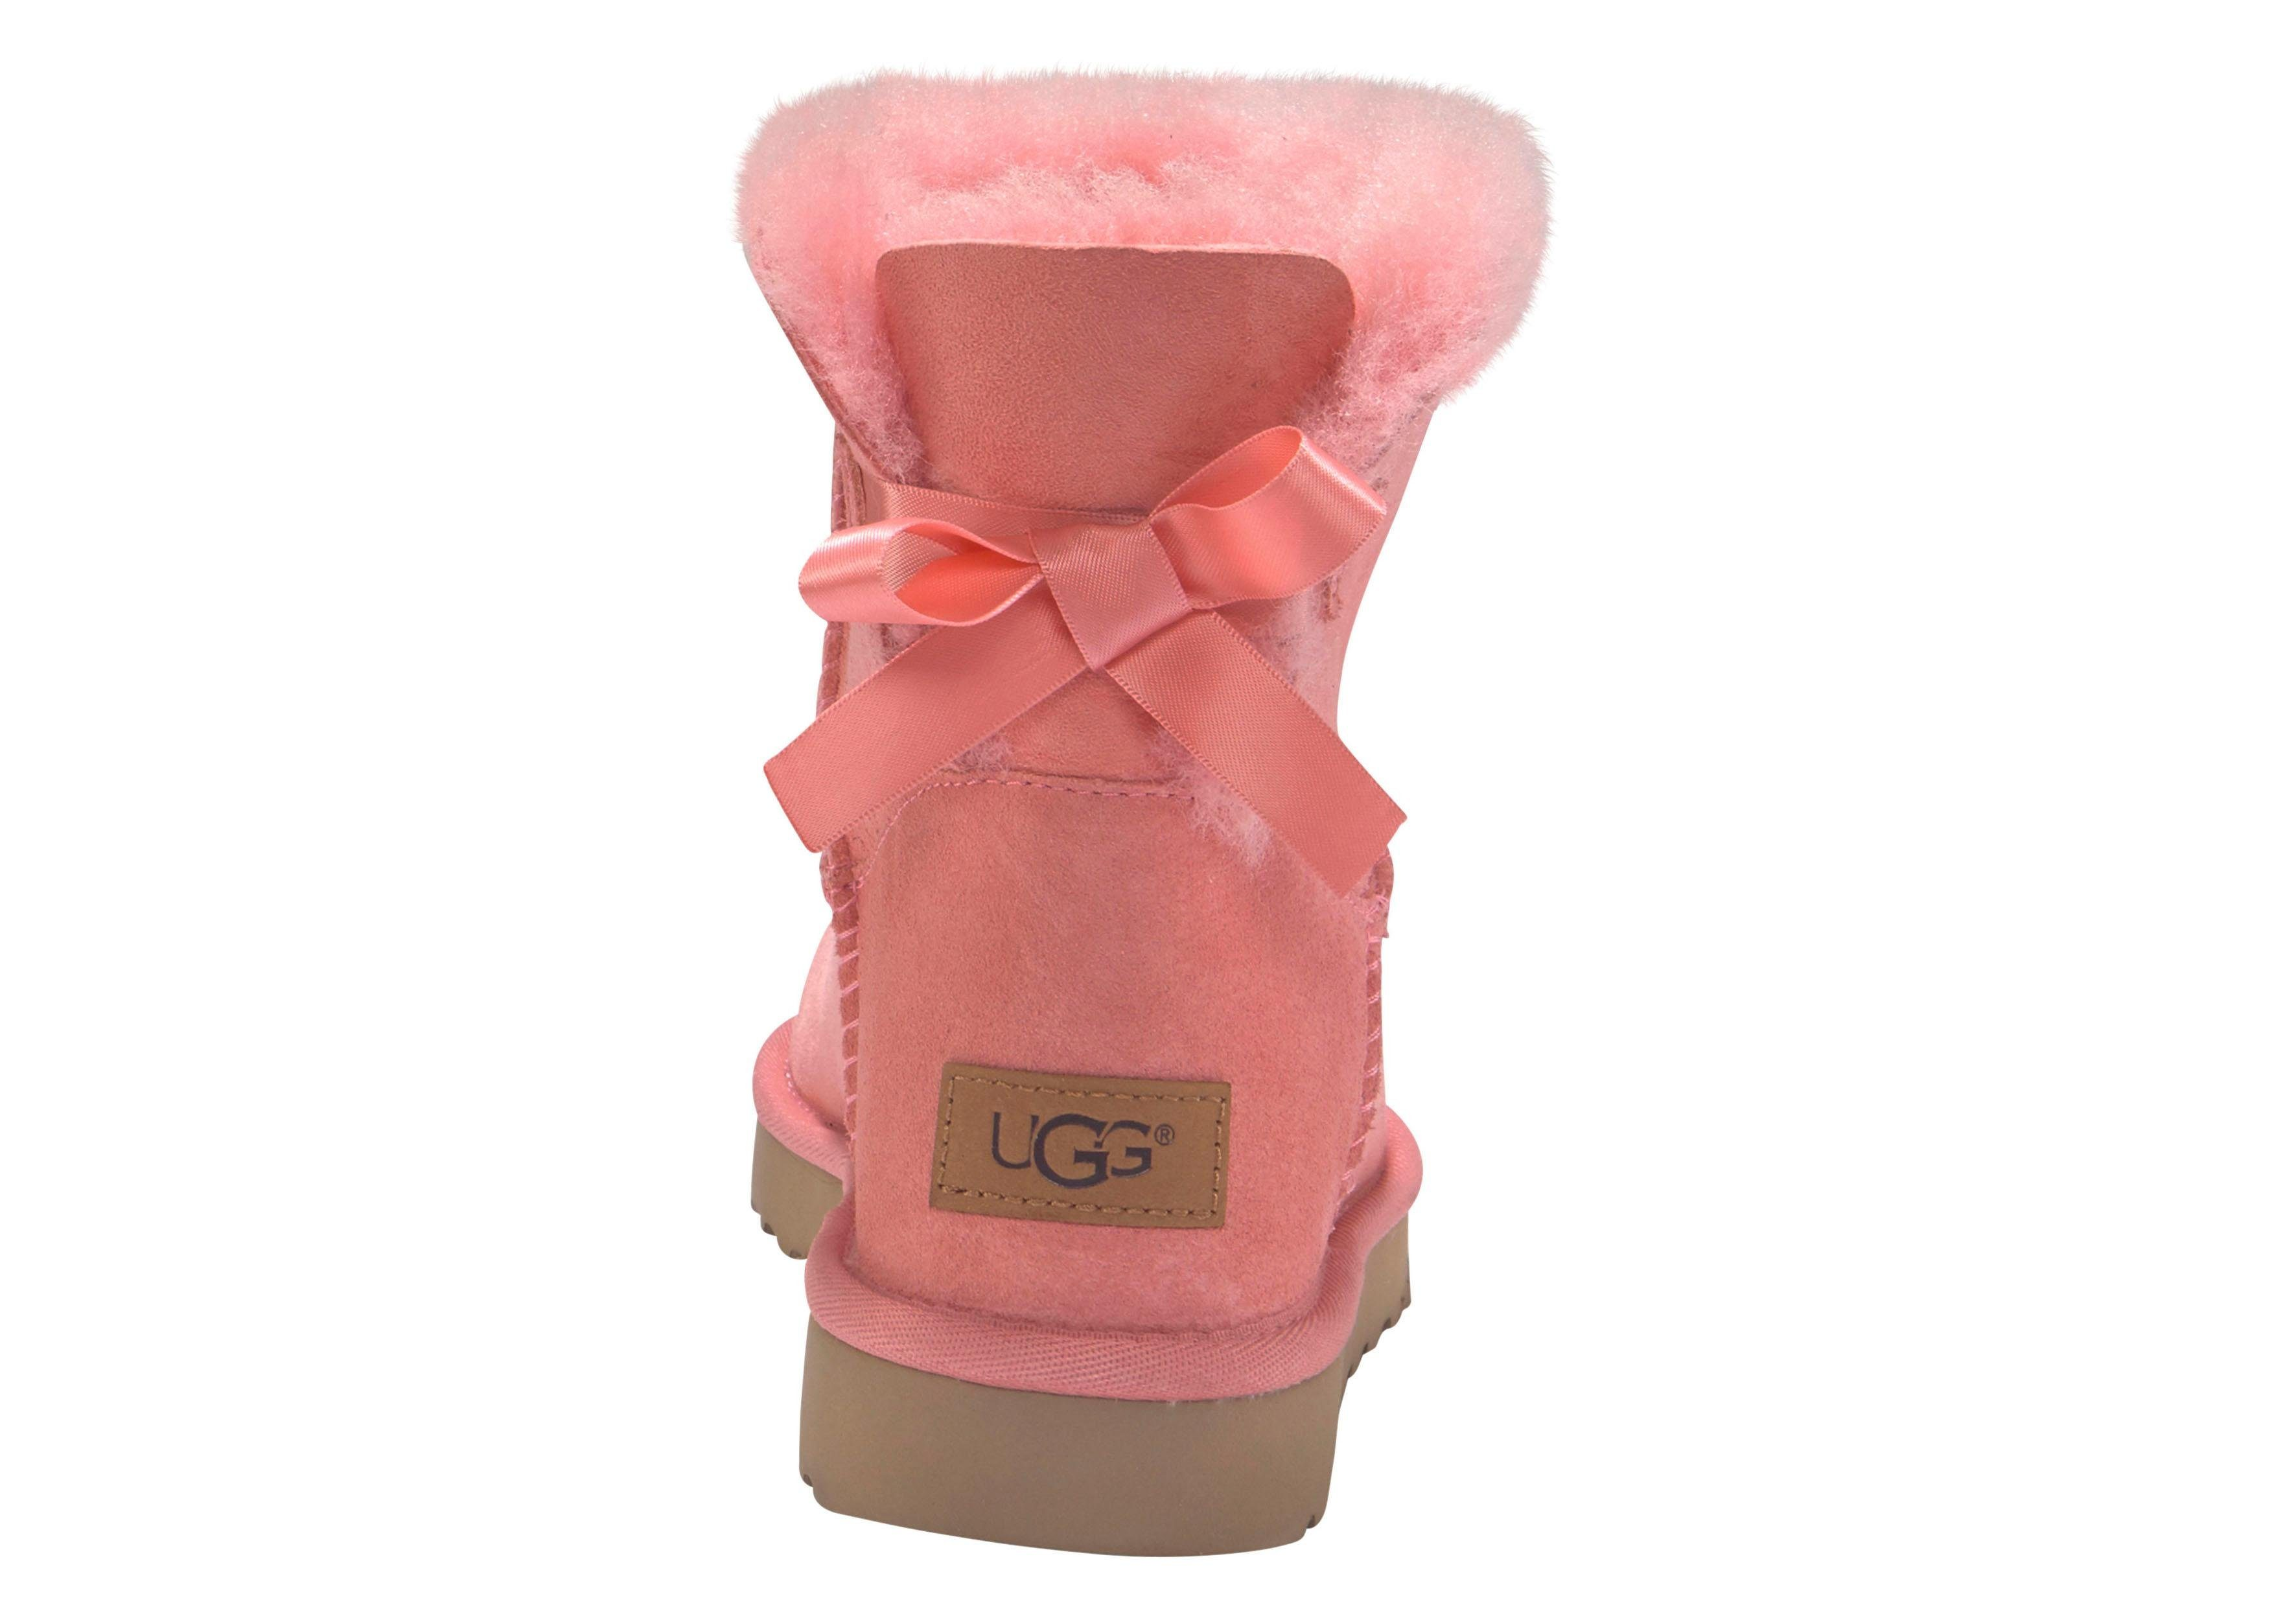 mini« boots bow zonder »satin ugg sluiting oranje fFwPWp7xqx